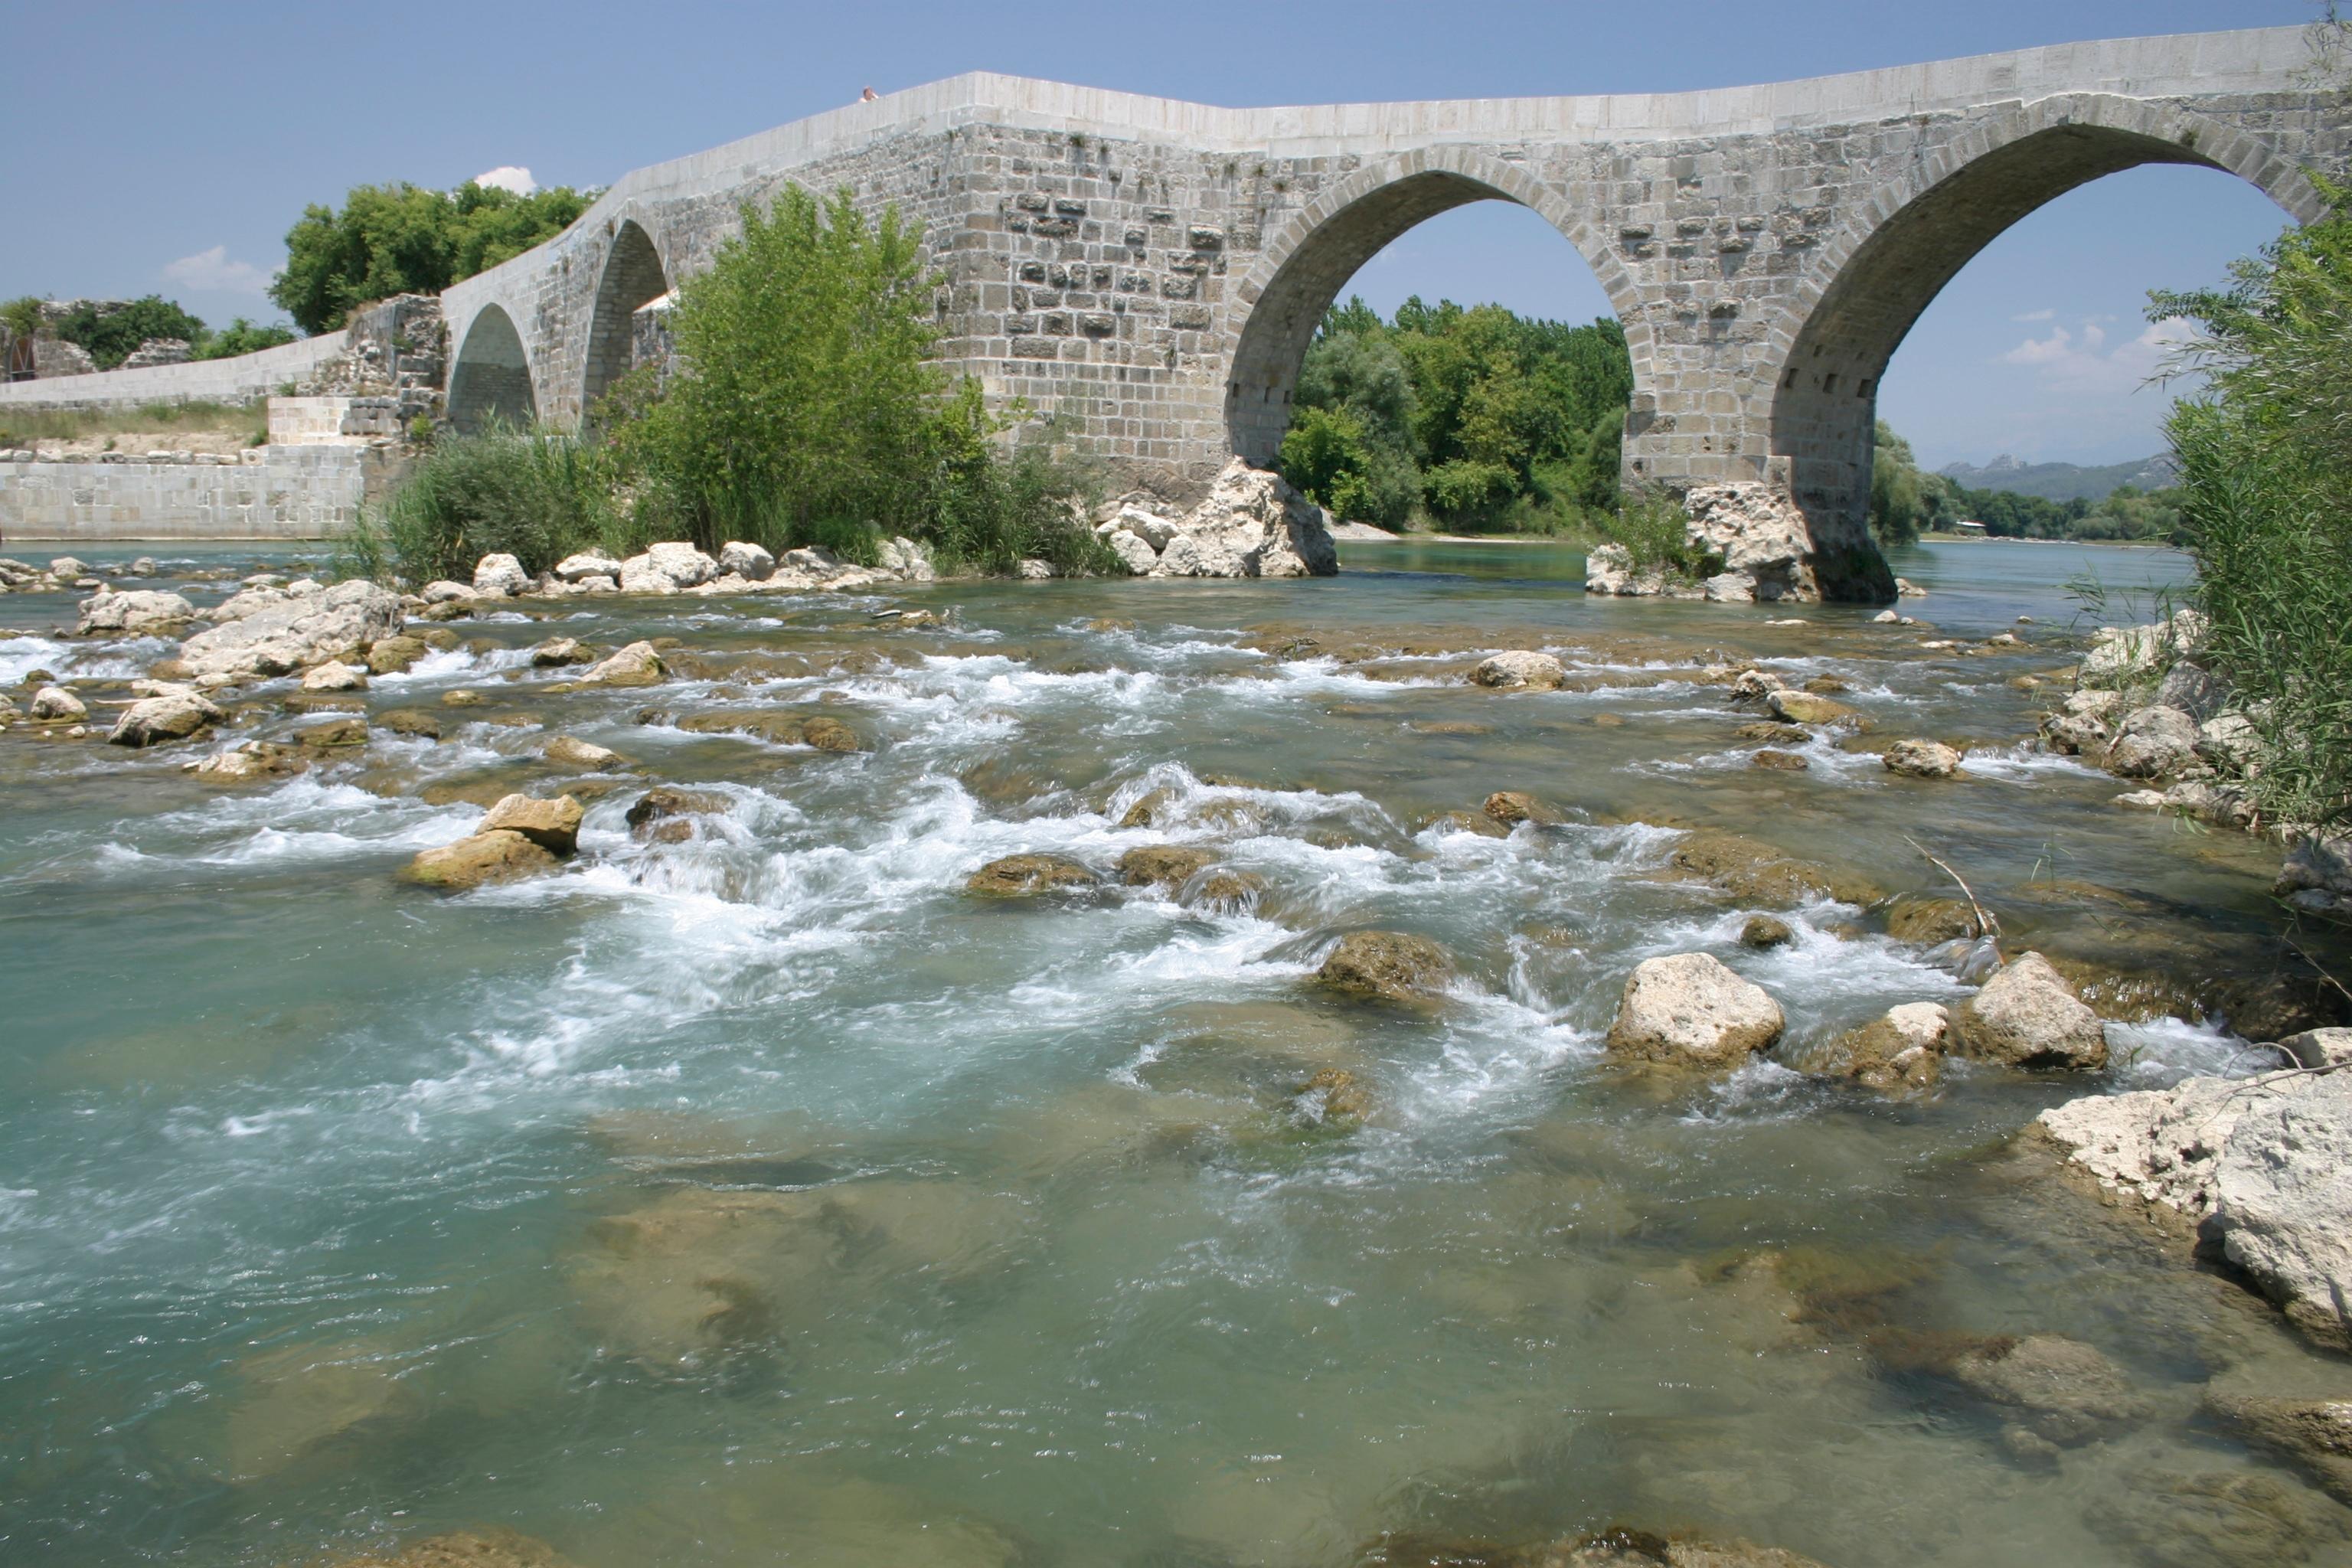 Köprüpazar Köprüsü